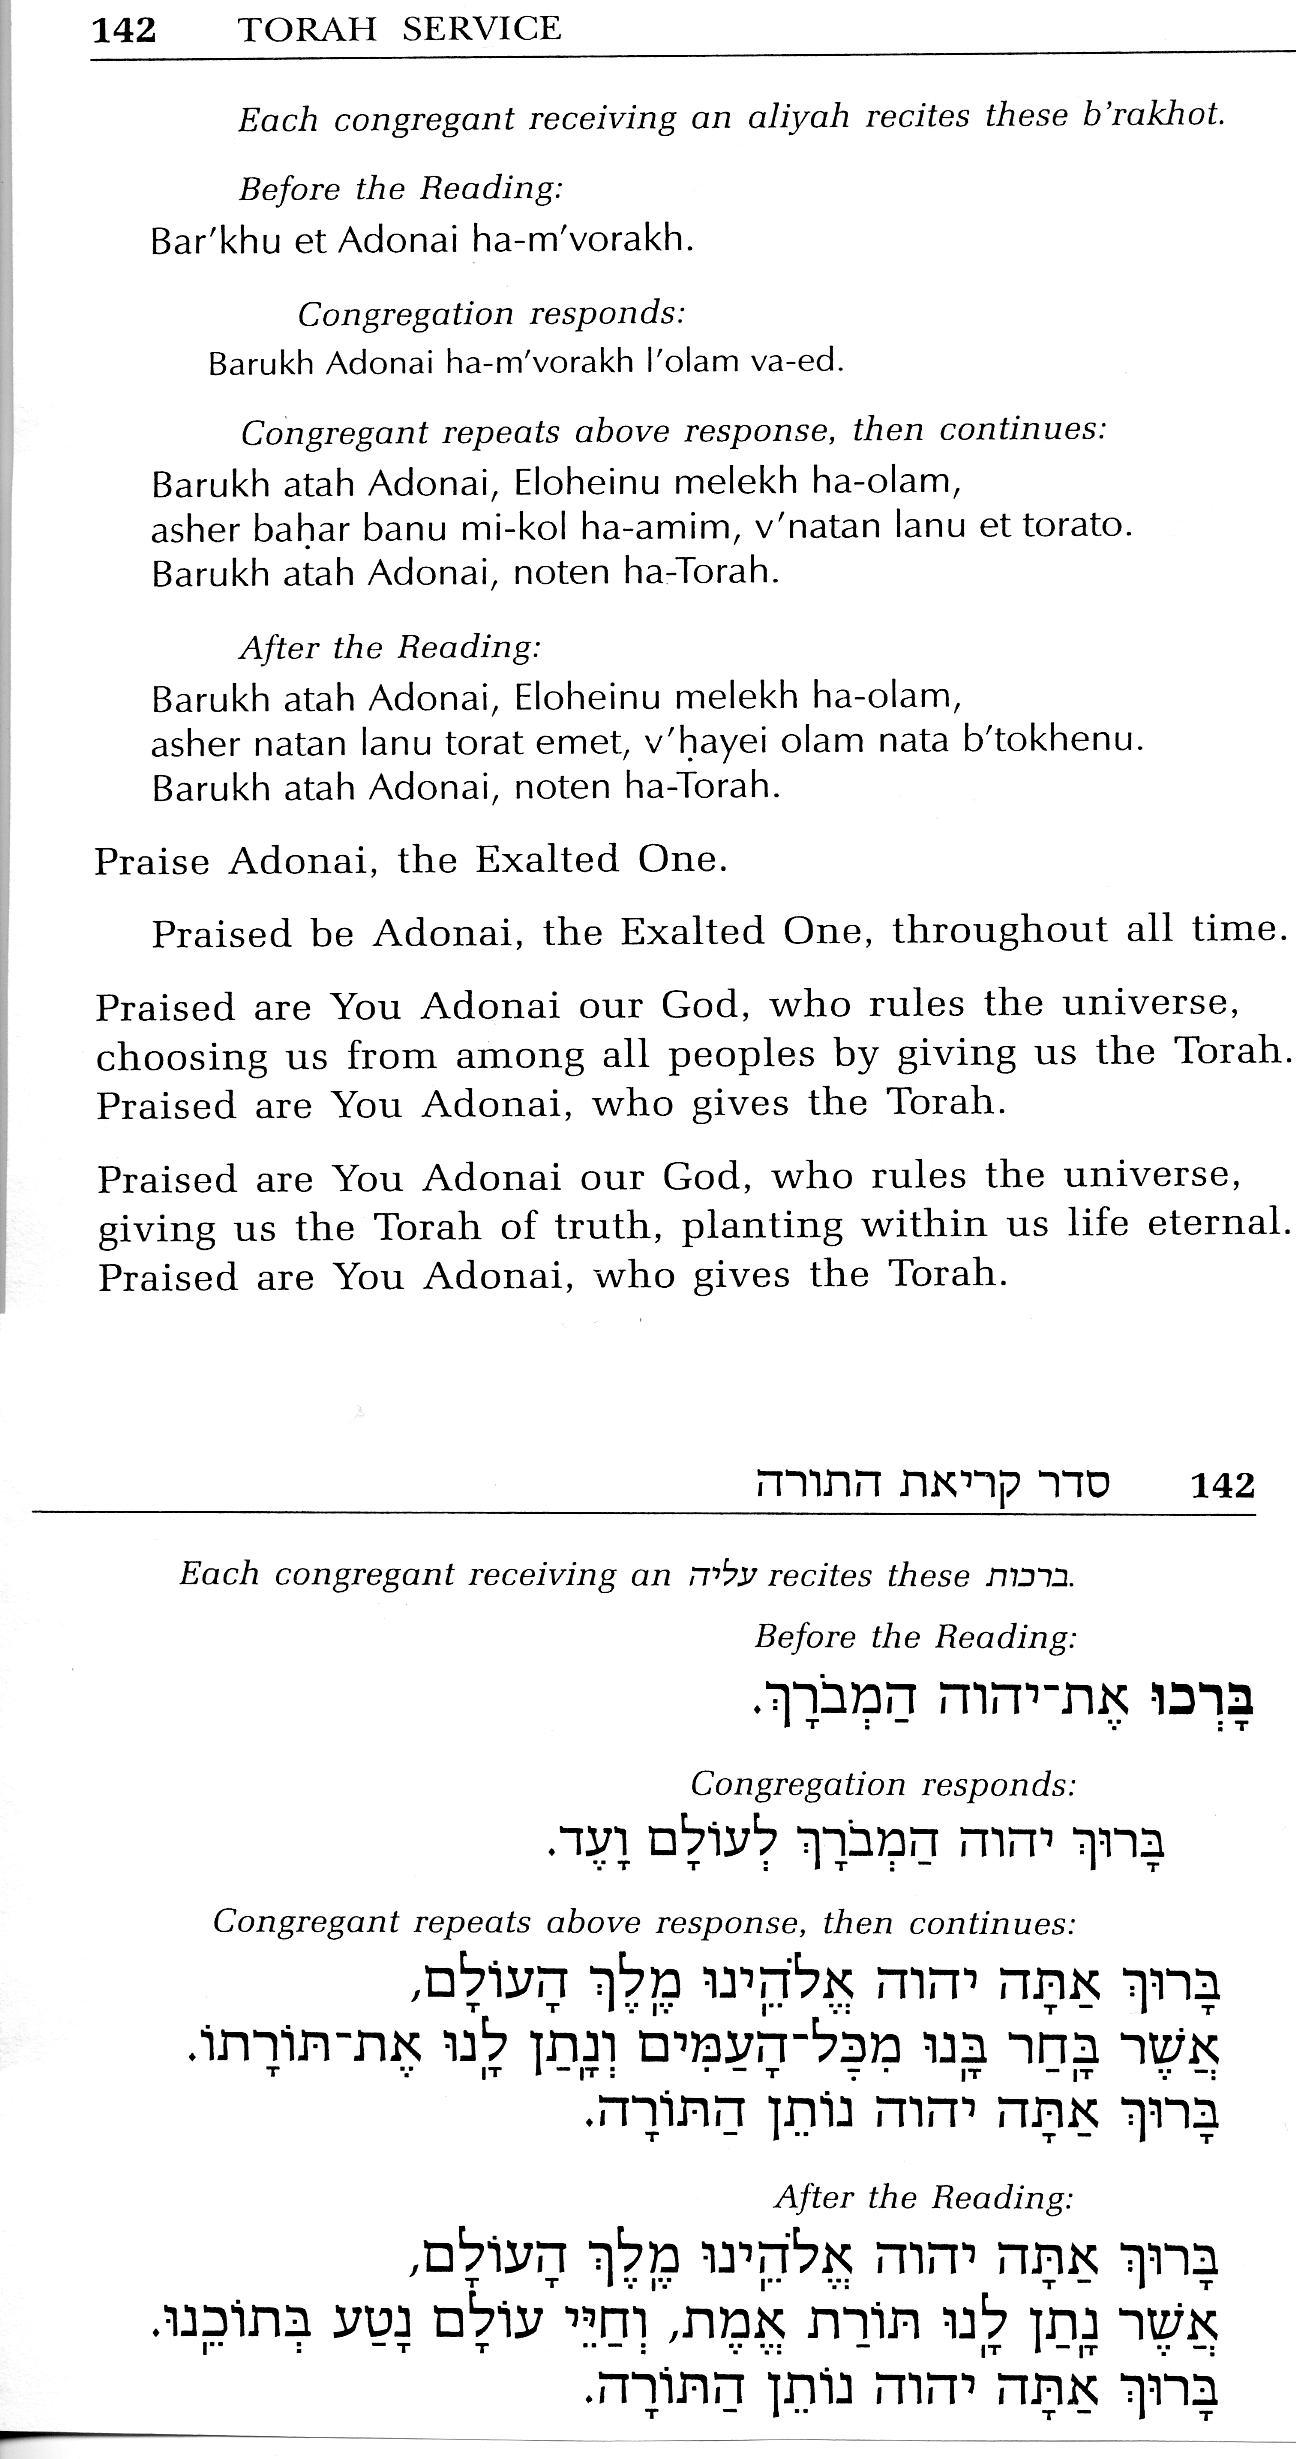 Torah Service Blessing